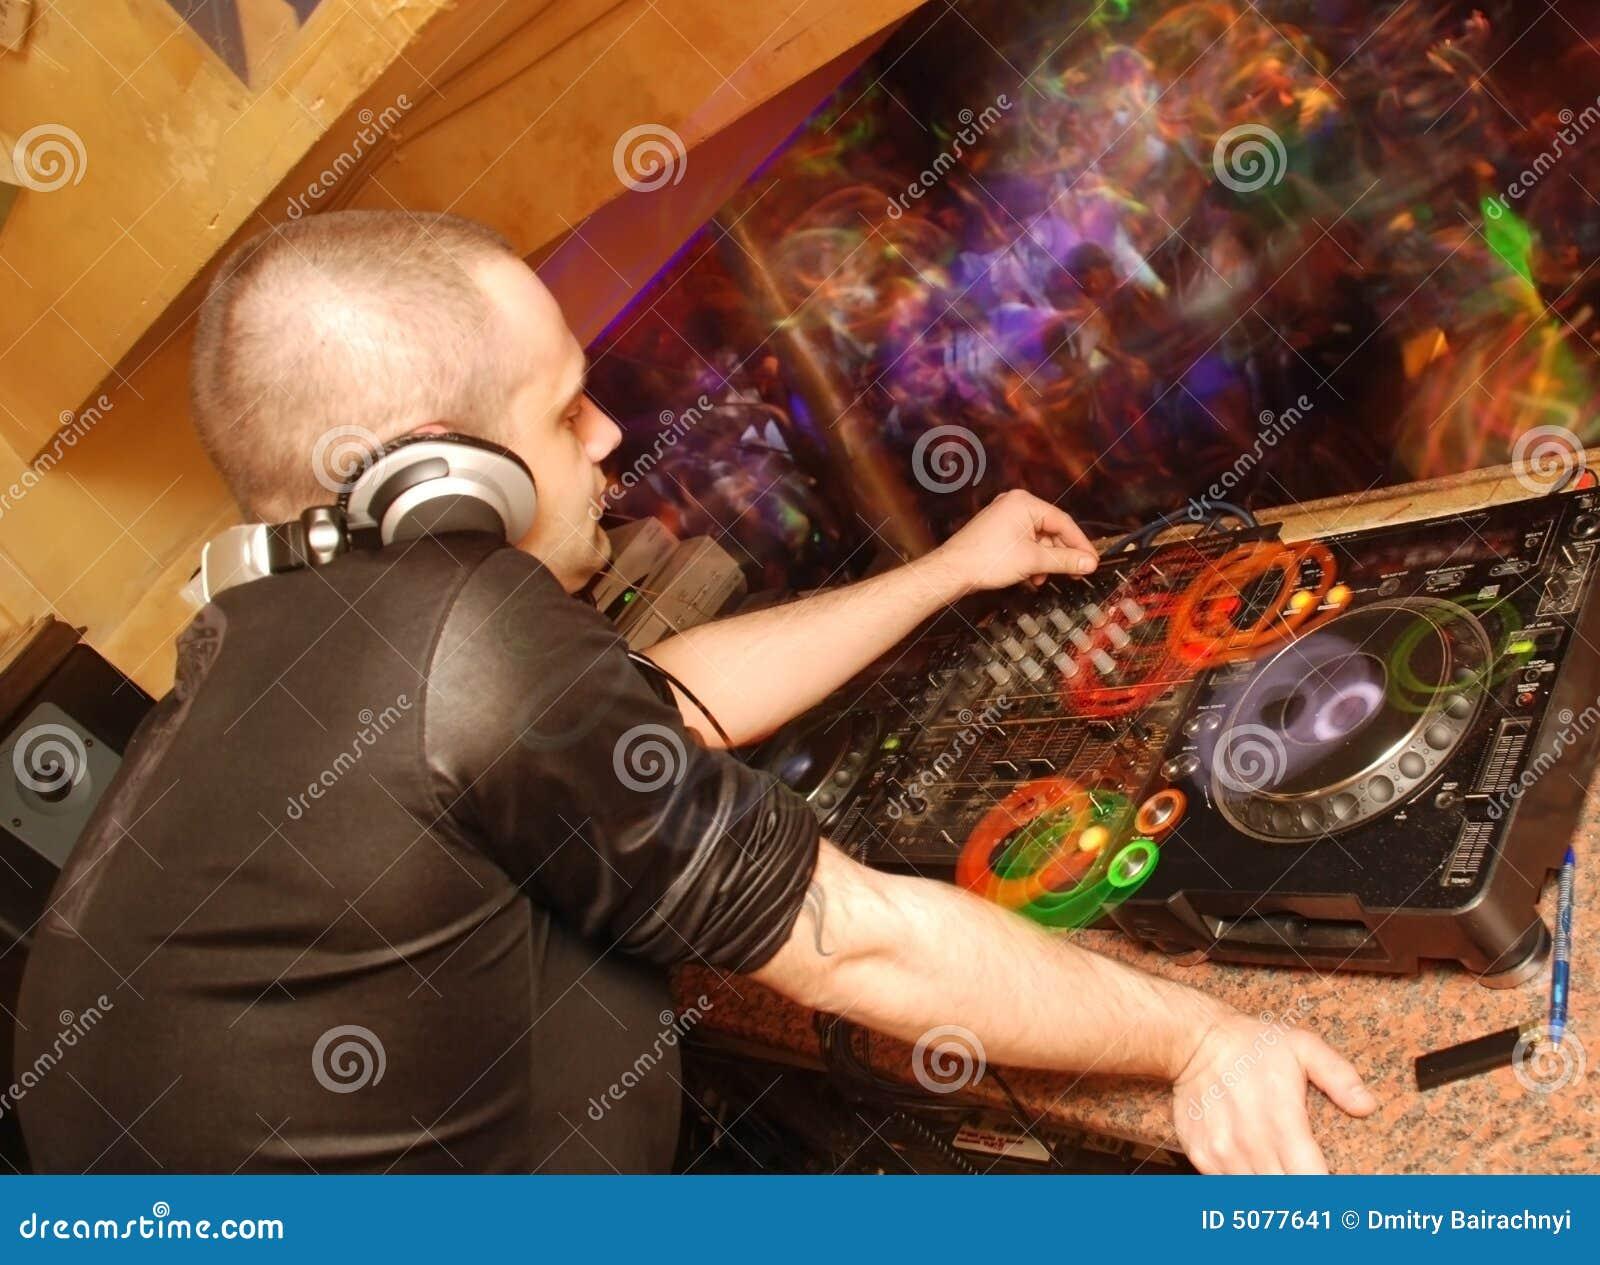 DJ in club